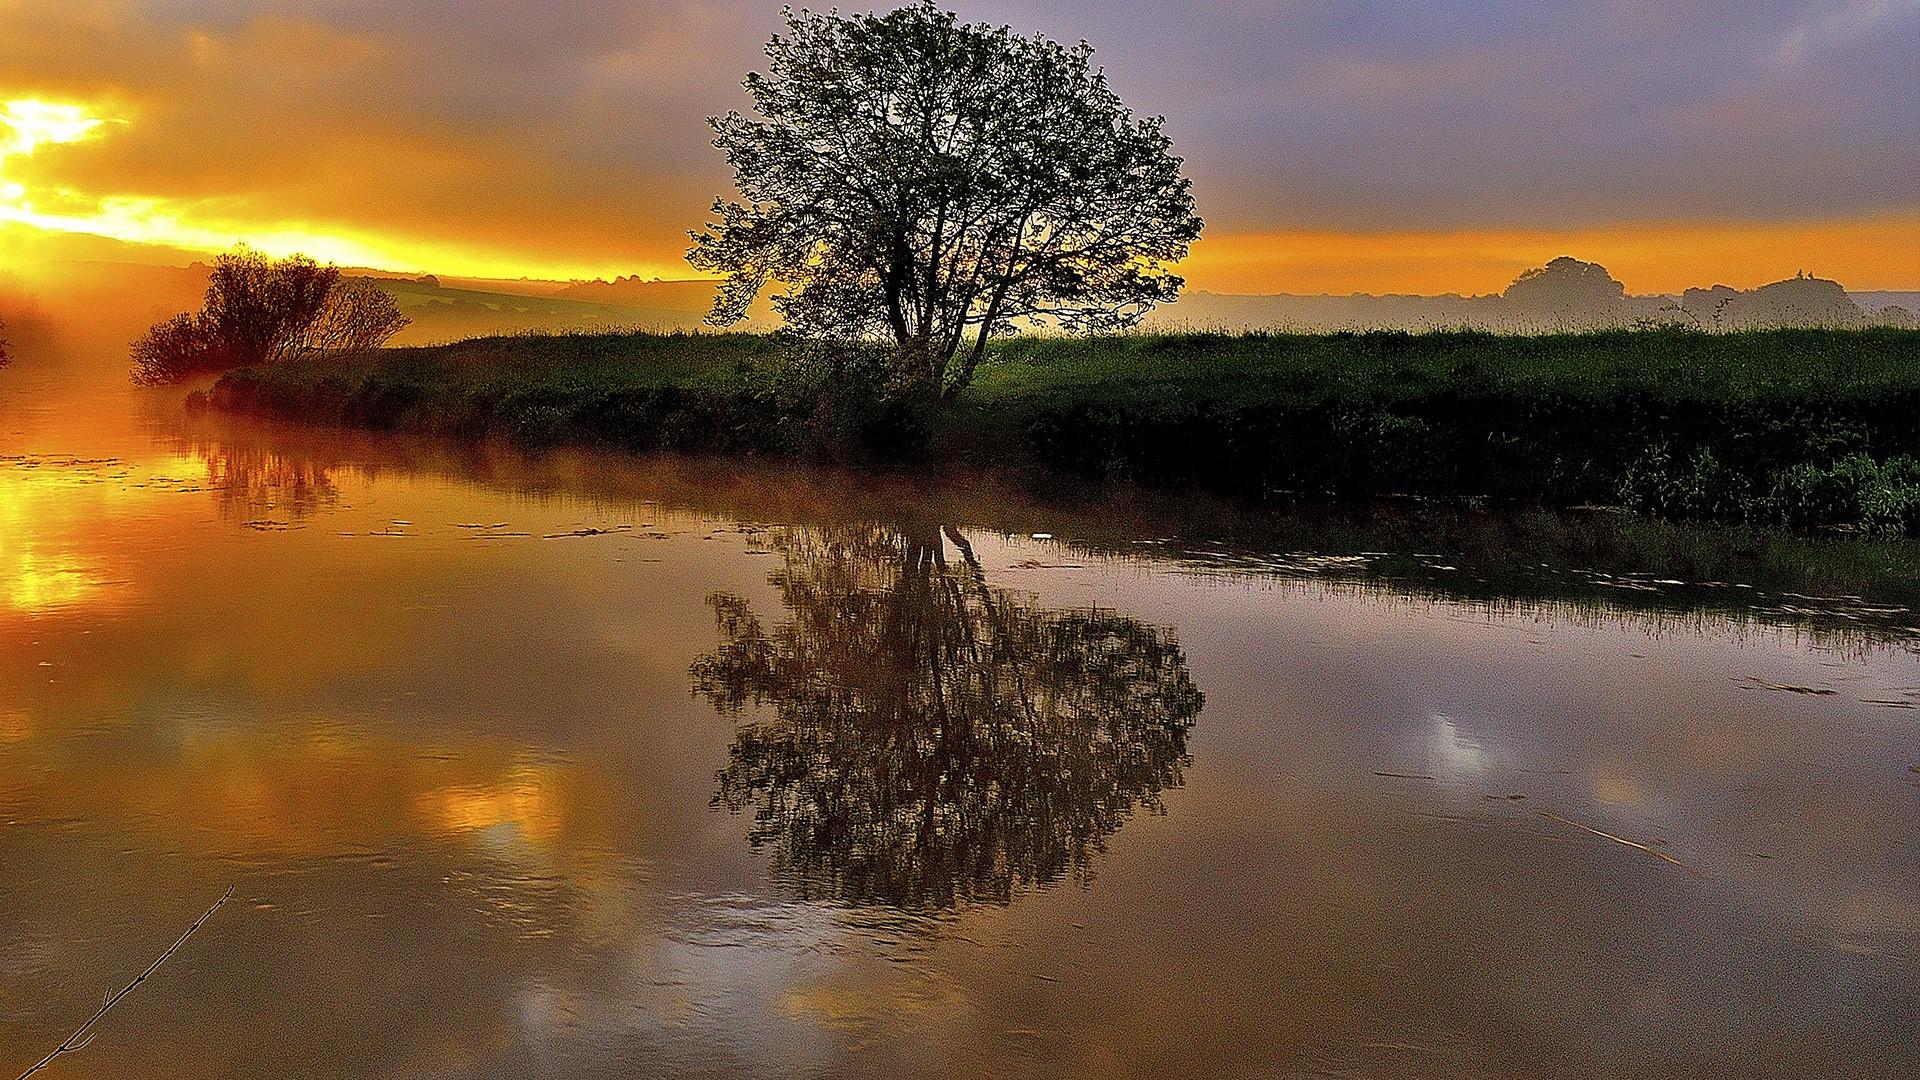 Sunrise Wonder River Arun England UK